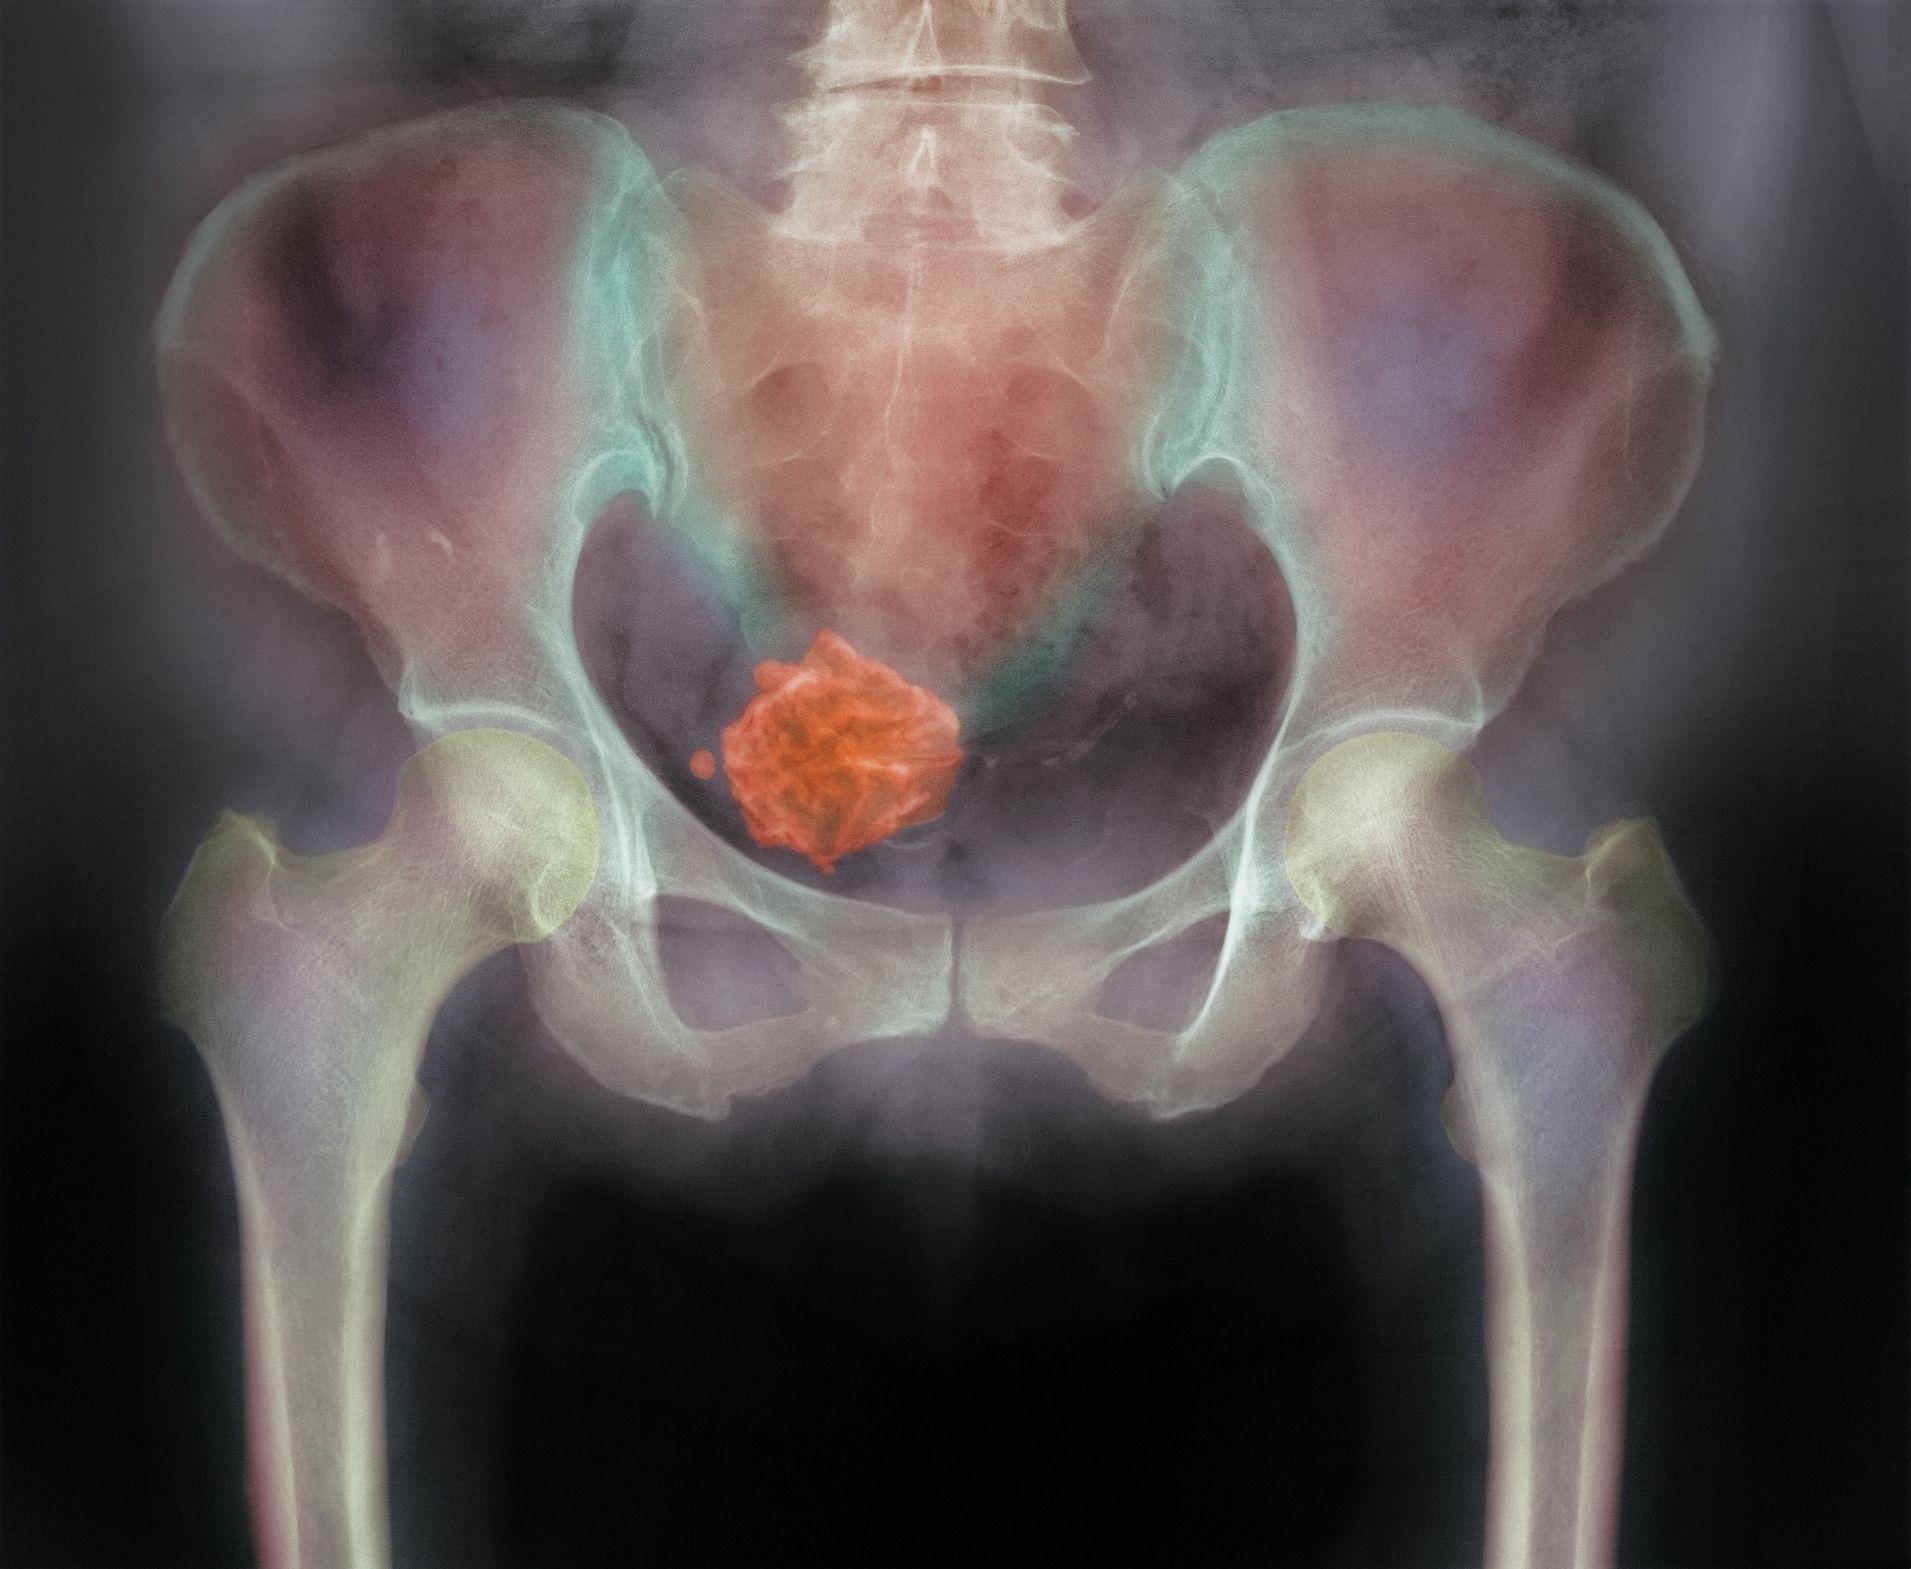 Natural Alternative Treatments for Uterine Fibroids